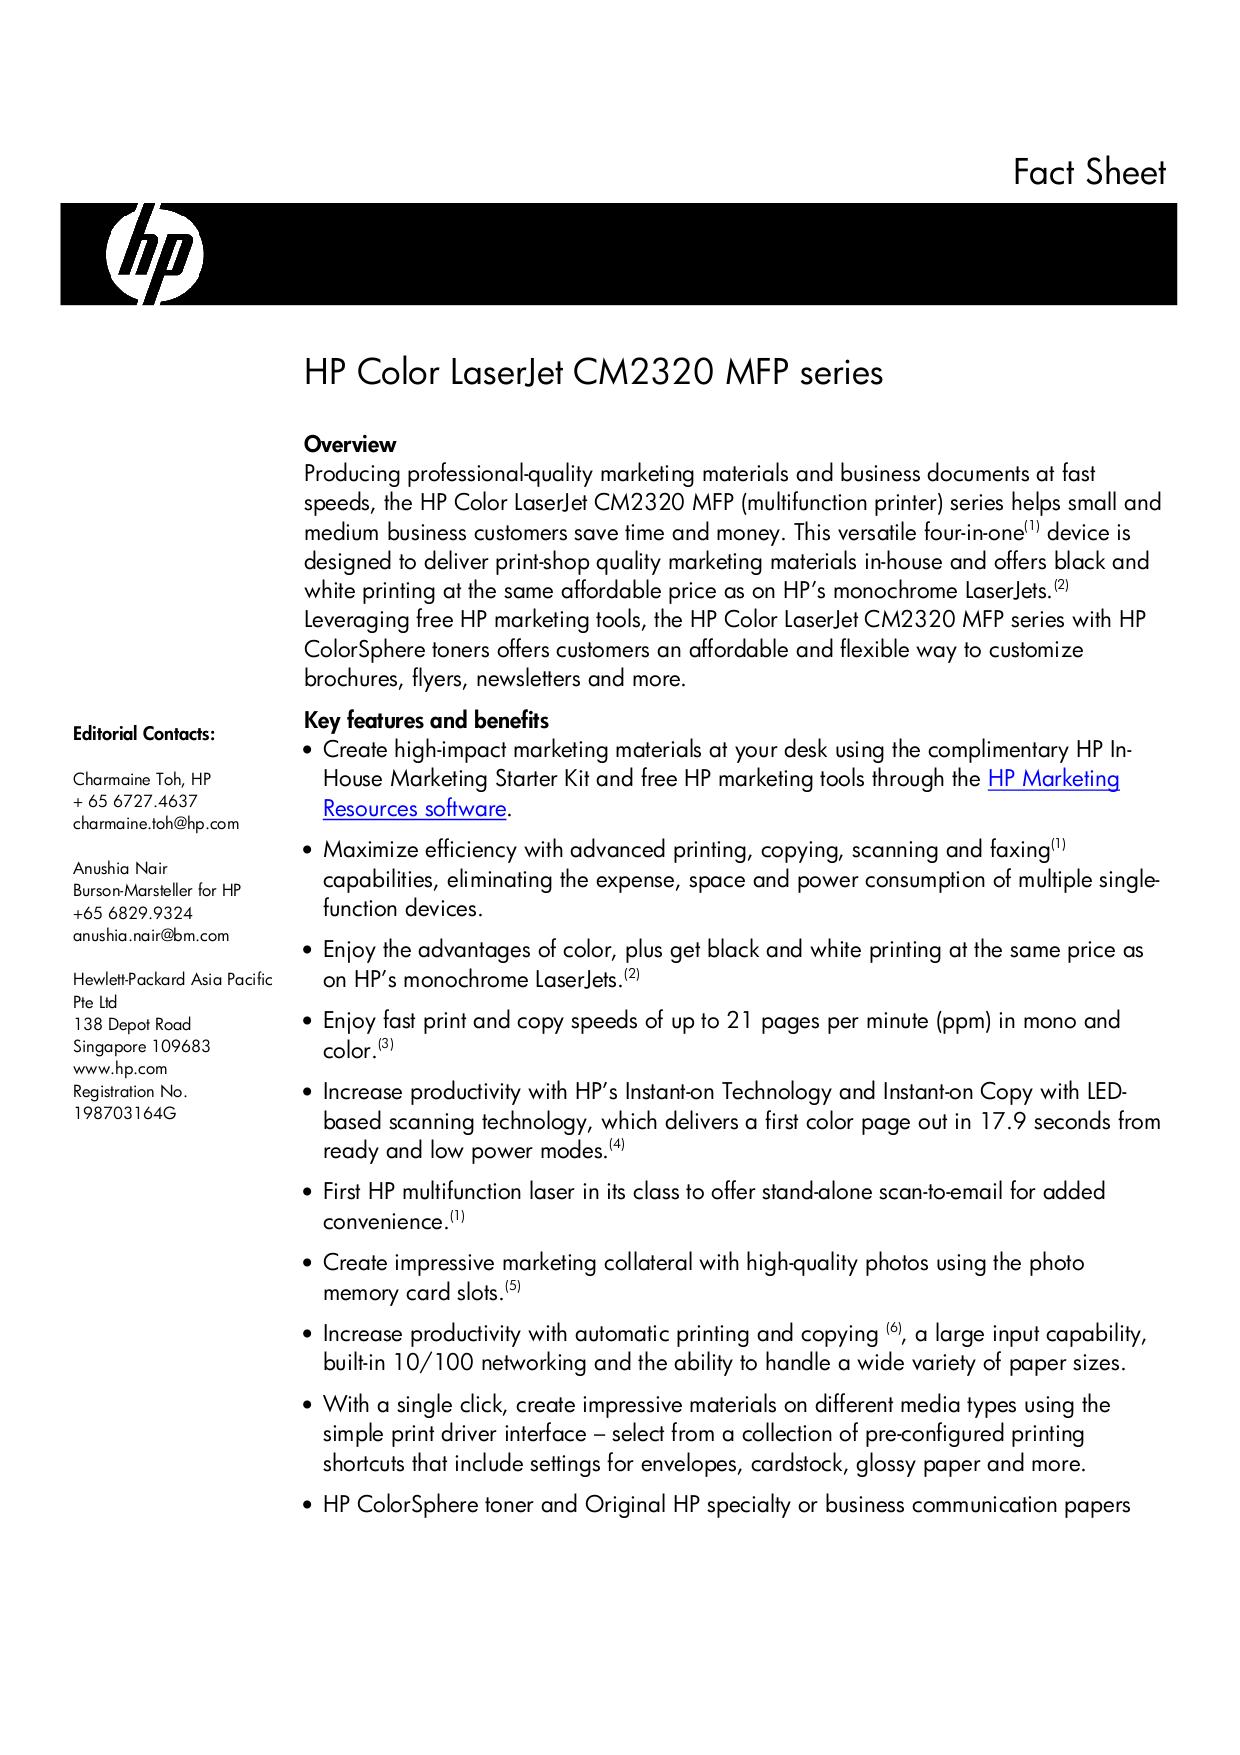 pdf for HP Multifunction Printer Laserjet,Color Laserjet CM2320fxi manual